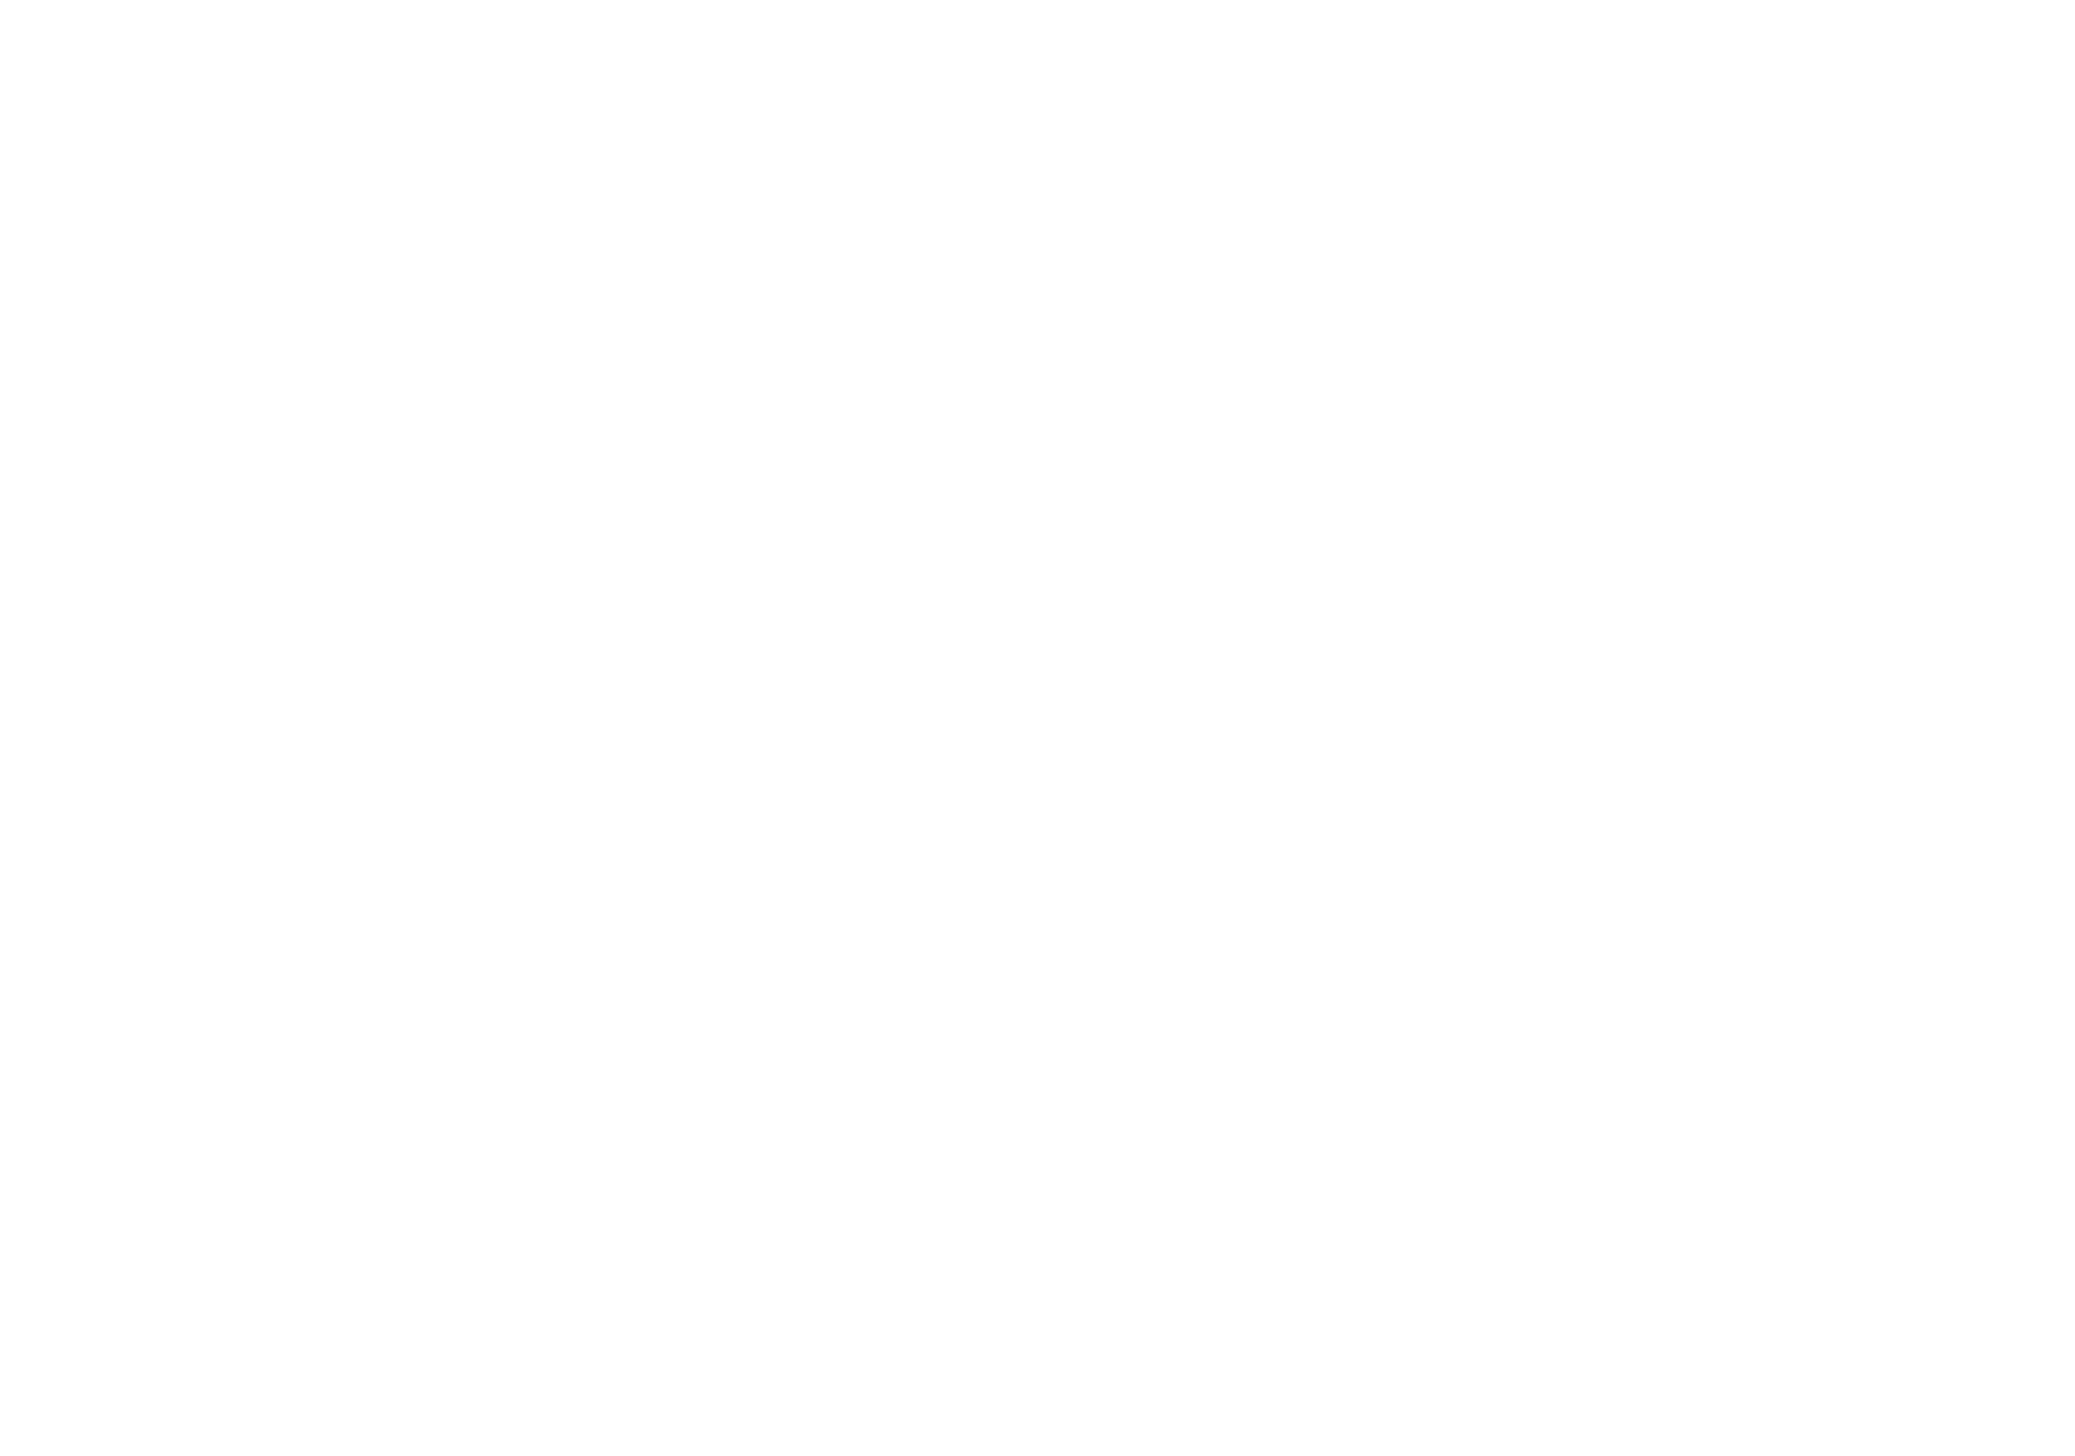 USSI White Logo